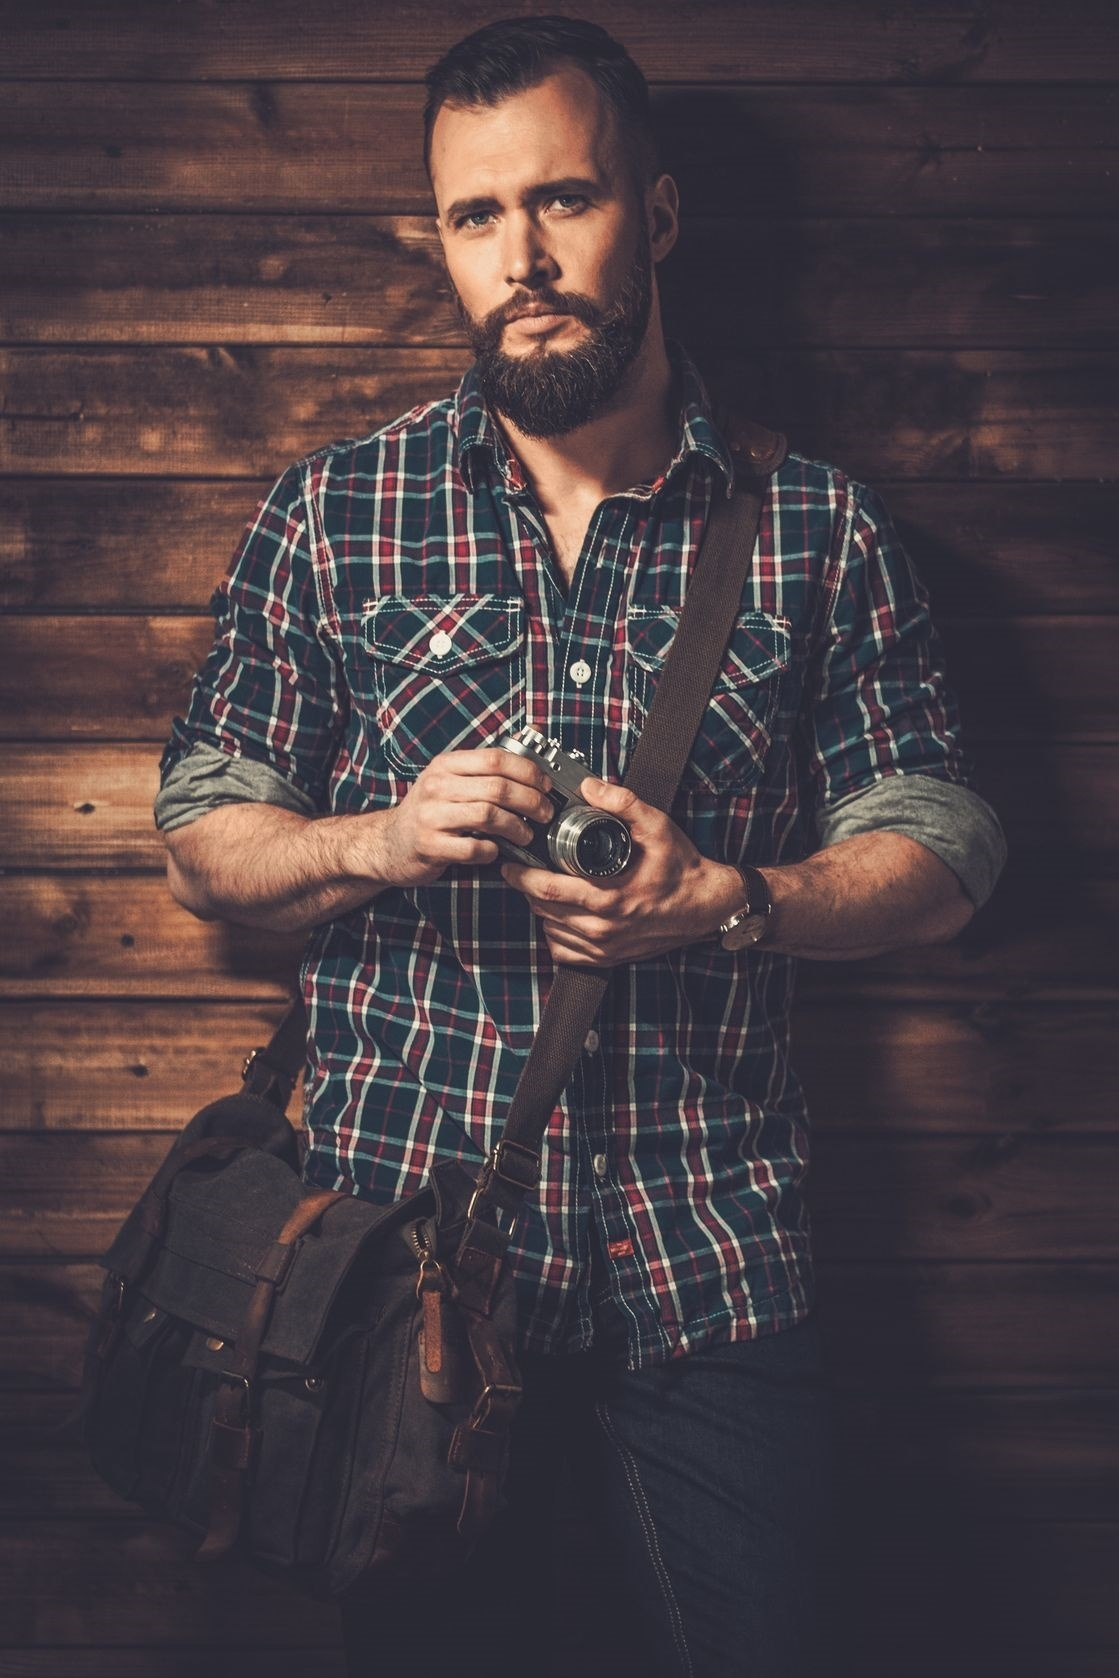 man with messenger bag and camera